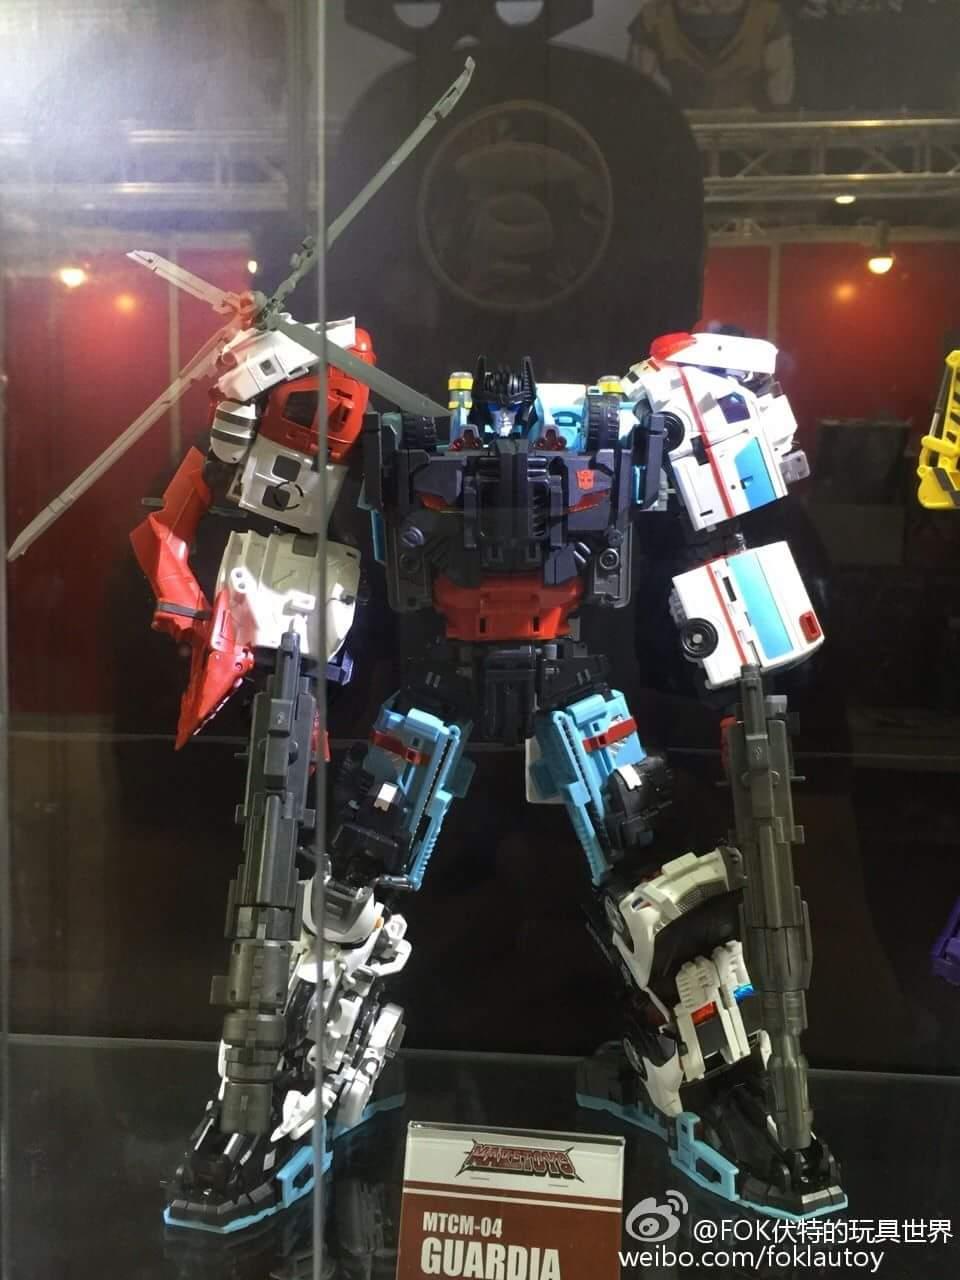 [MakeToys] Produit Tiers - Jouet MTCM-04 Guardia (aka Protectobots - Defensor/Defenso) - Page 4 Y07DwrNu